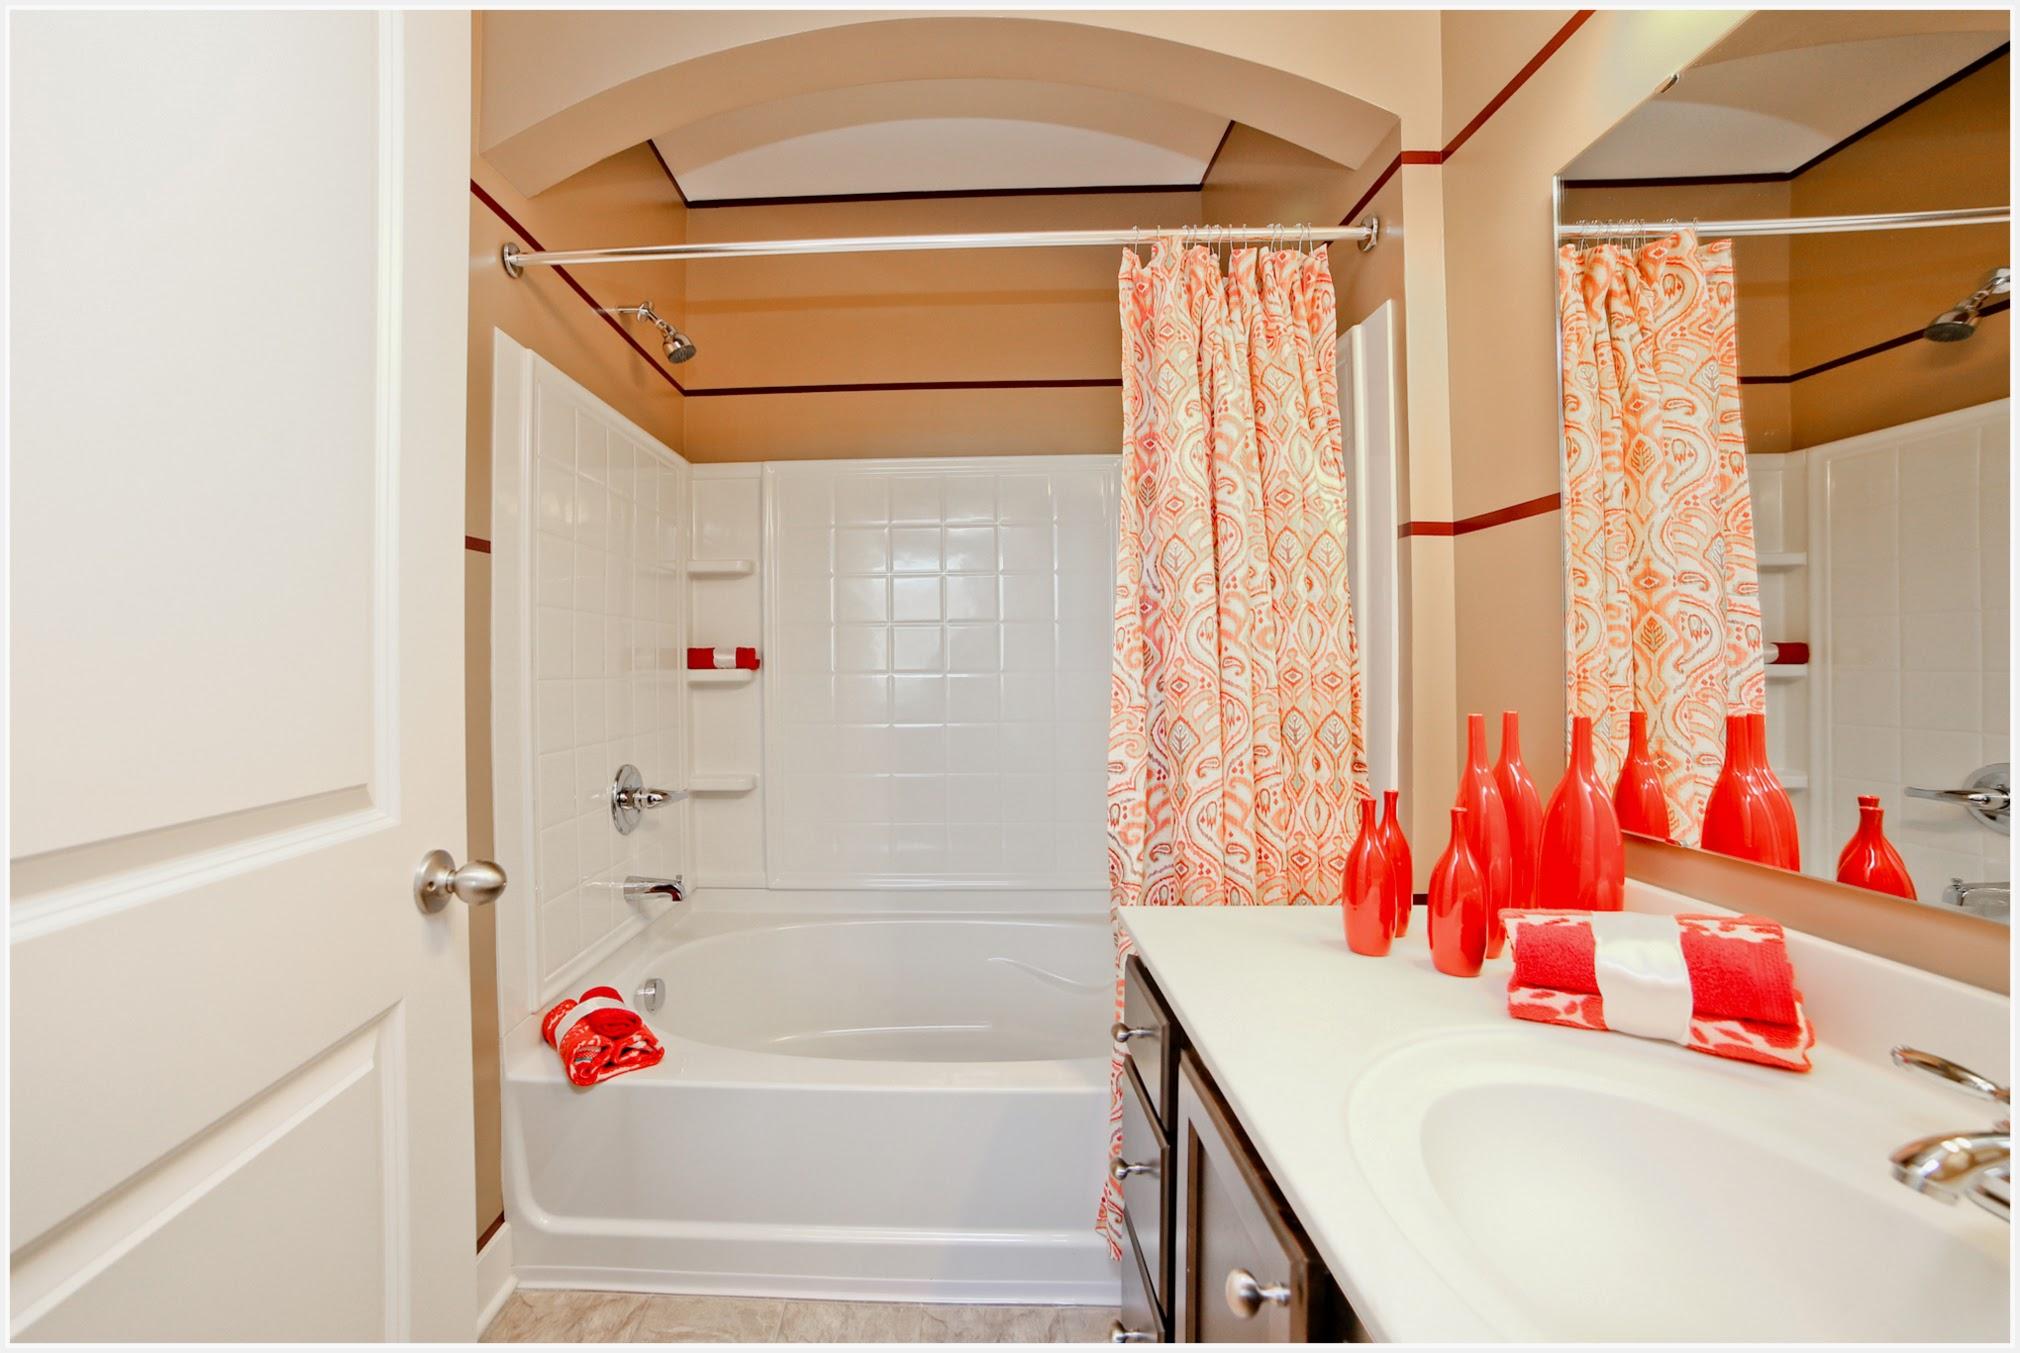 Hamilton - Model bathroom 1 (apartment).jpg